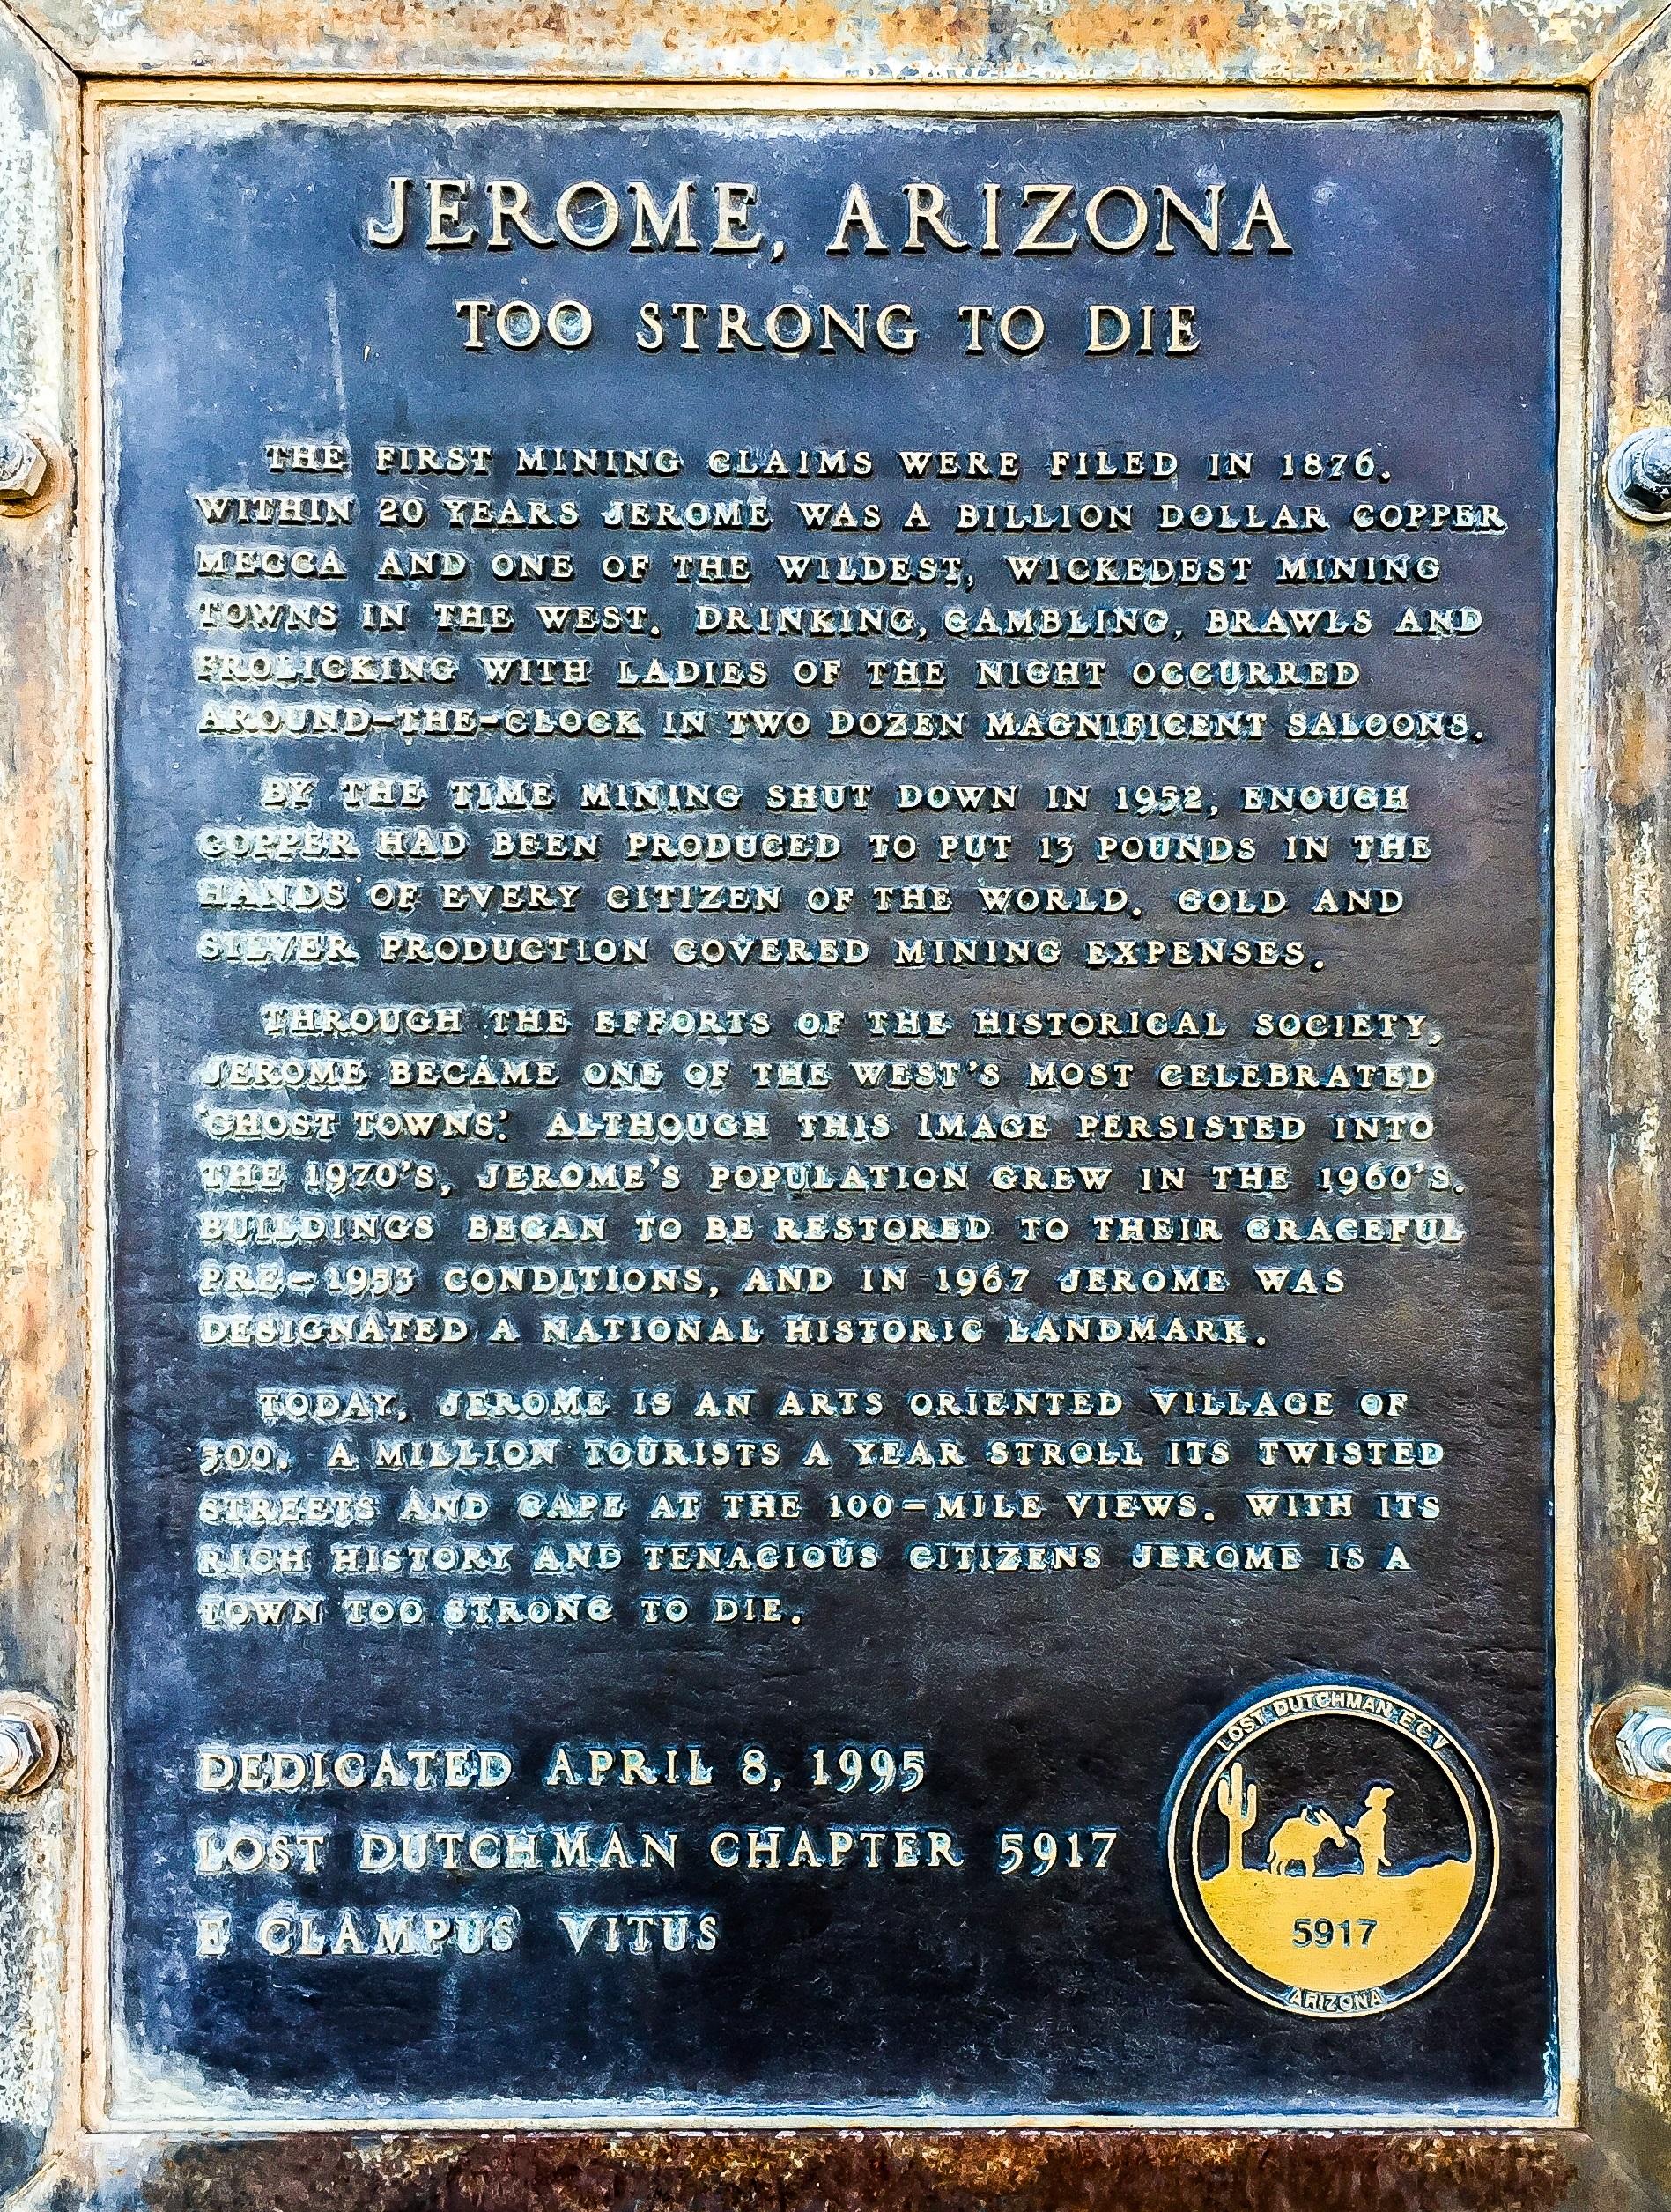 Jerome Founding Plaque